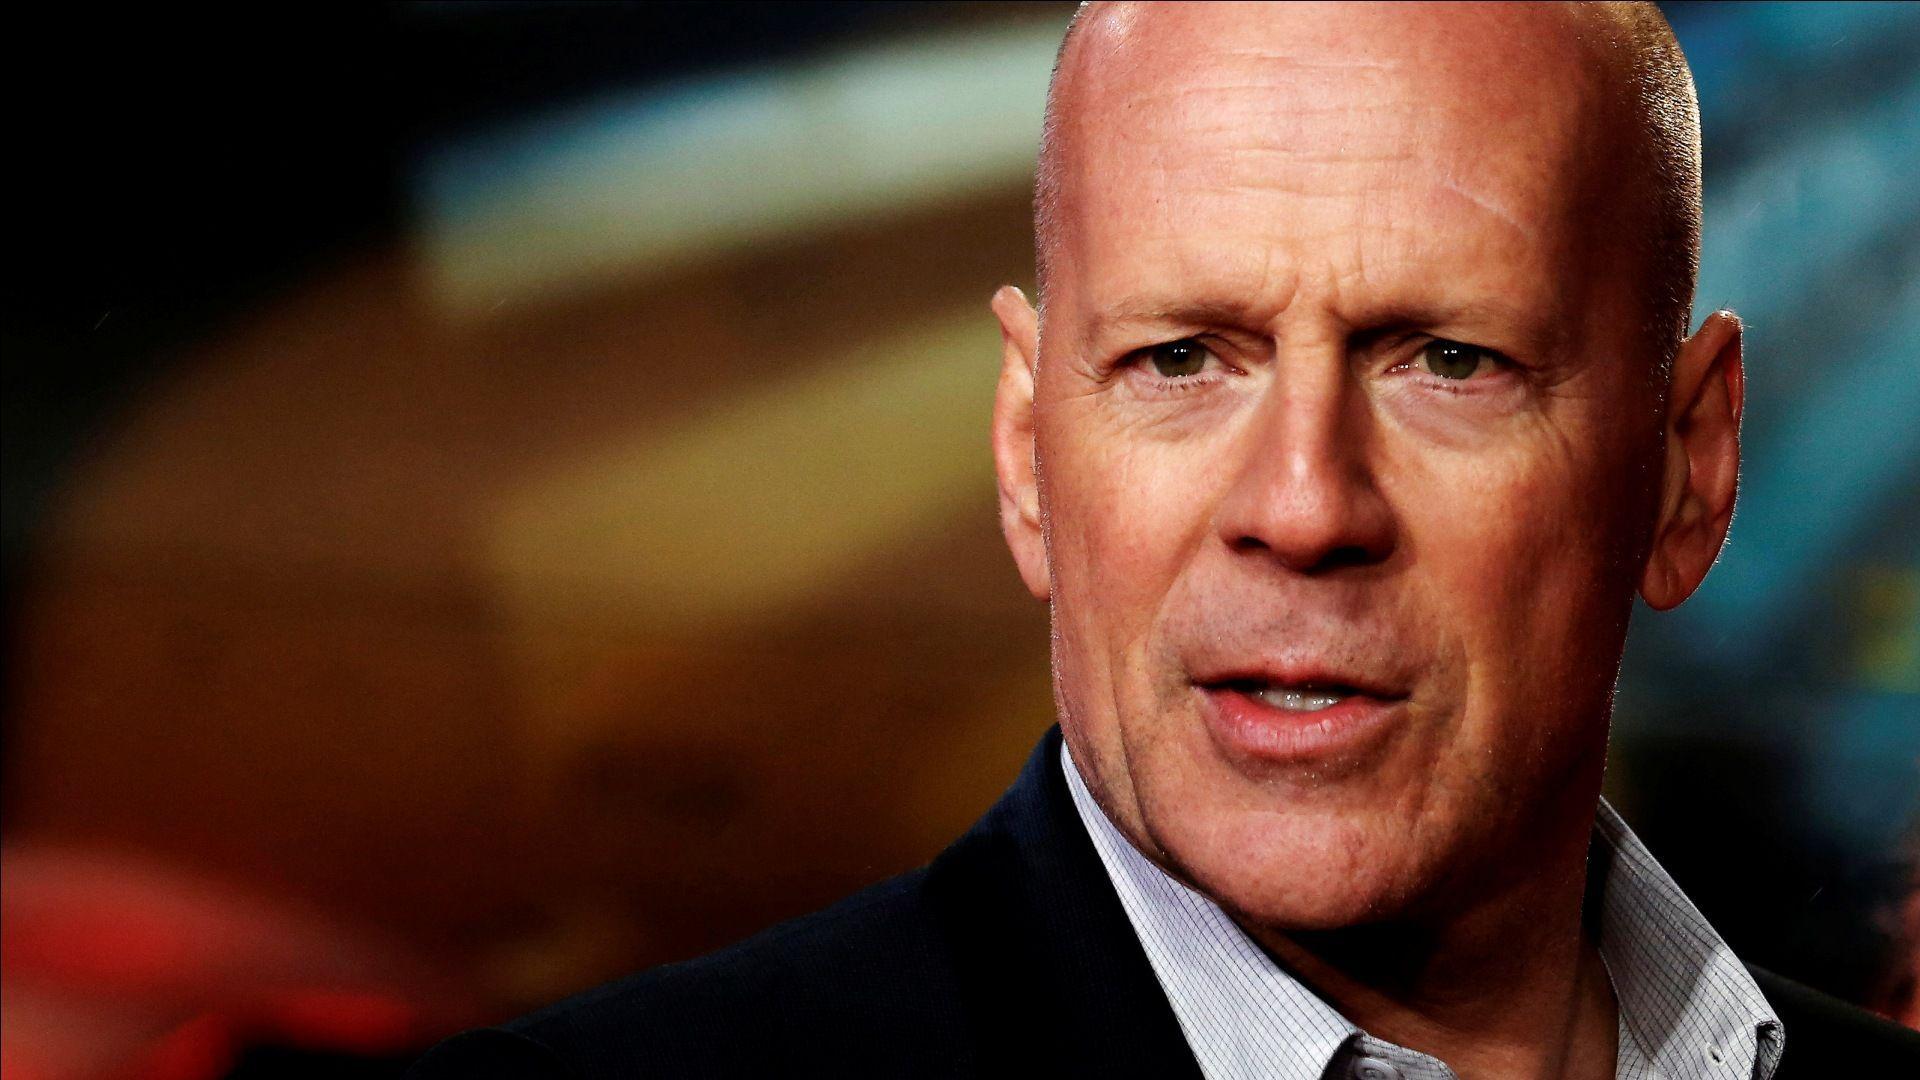 Bruce Willis fa 60 anni: l'attore di Die Hard papà per la quinta volta